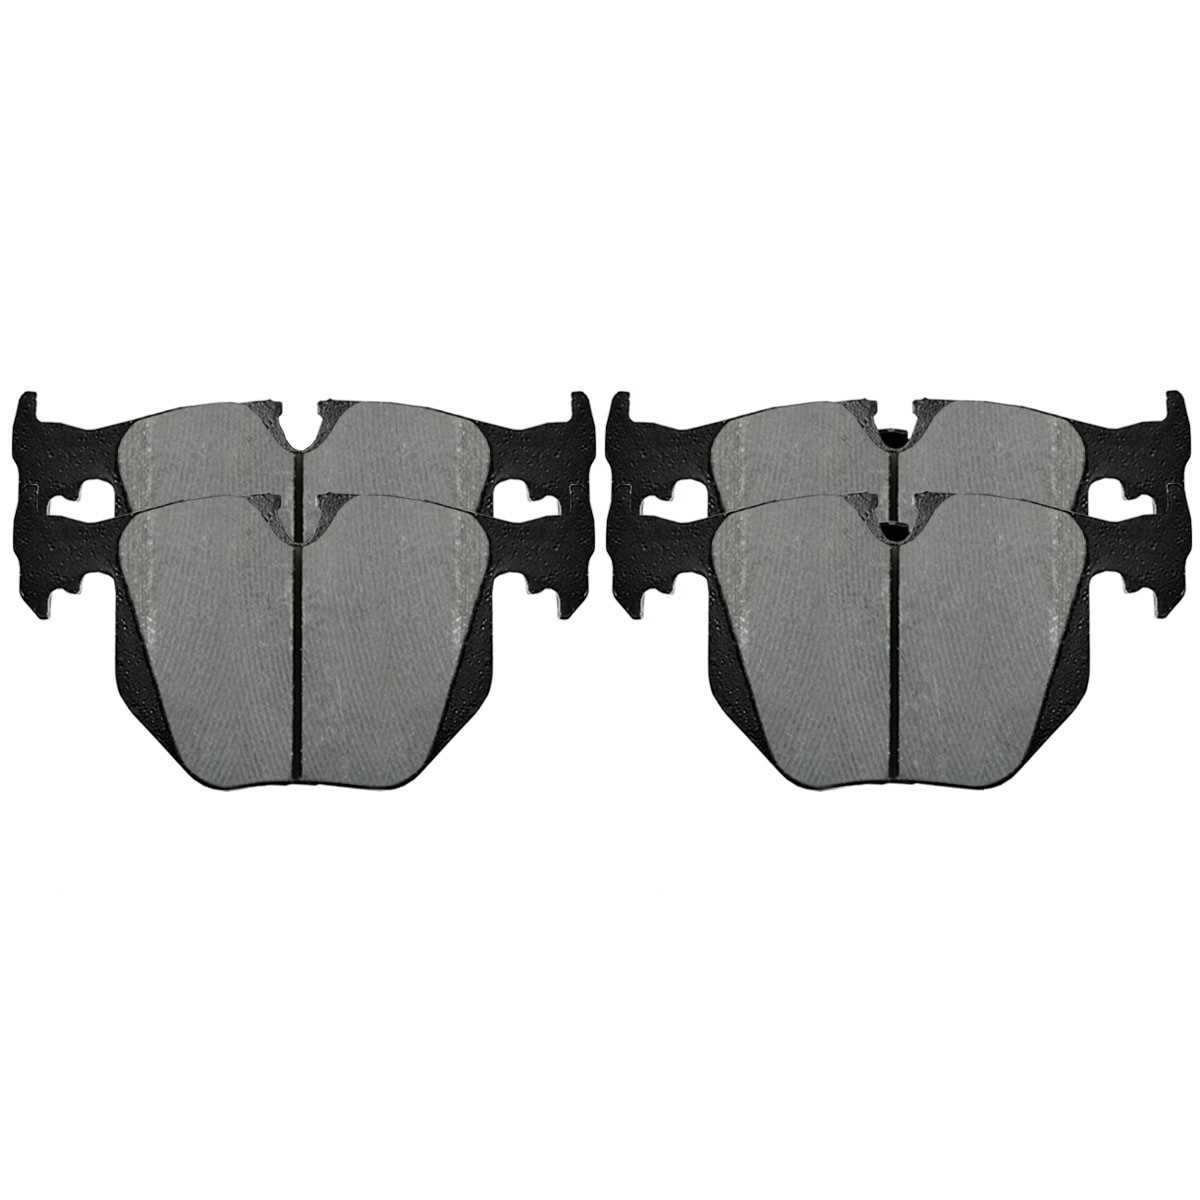 Auto Shack SMK1294 Front Semi Metallic Brake Pads